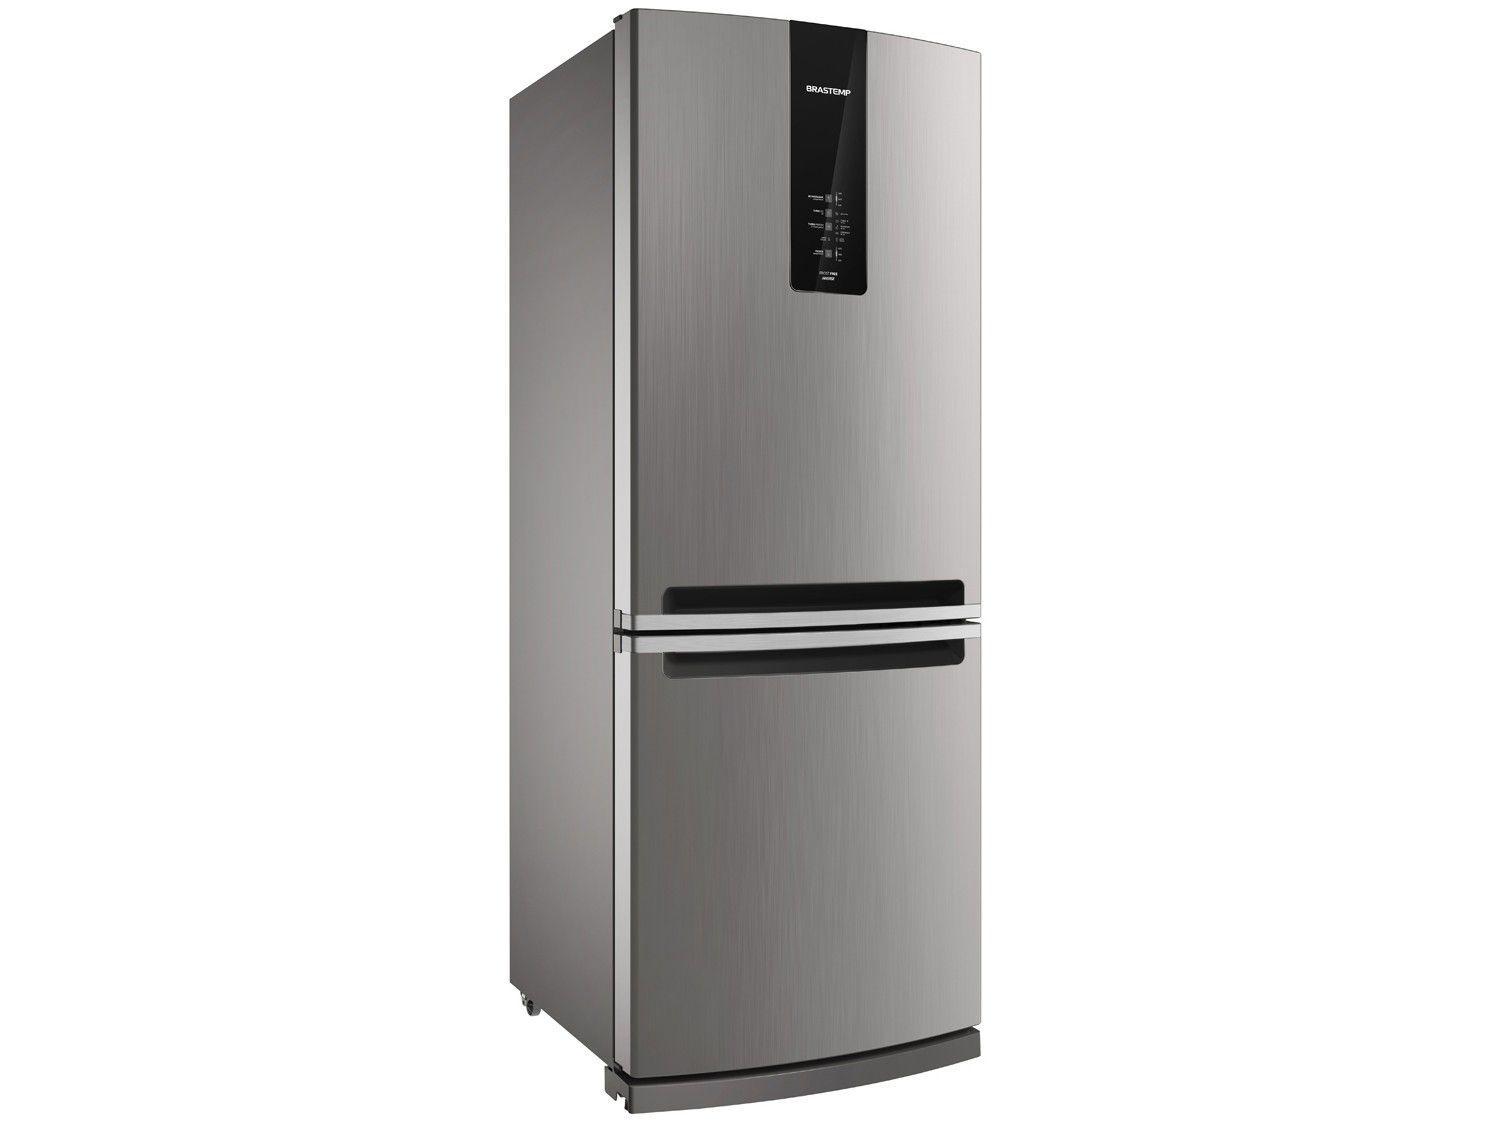 Geladeira/Refrigerador Brastemp Frost Free Inverse - 443L com Turbo Ice BRE57 AKANA